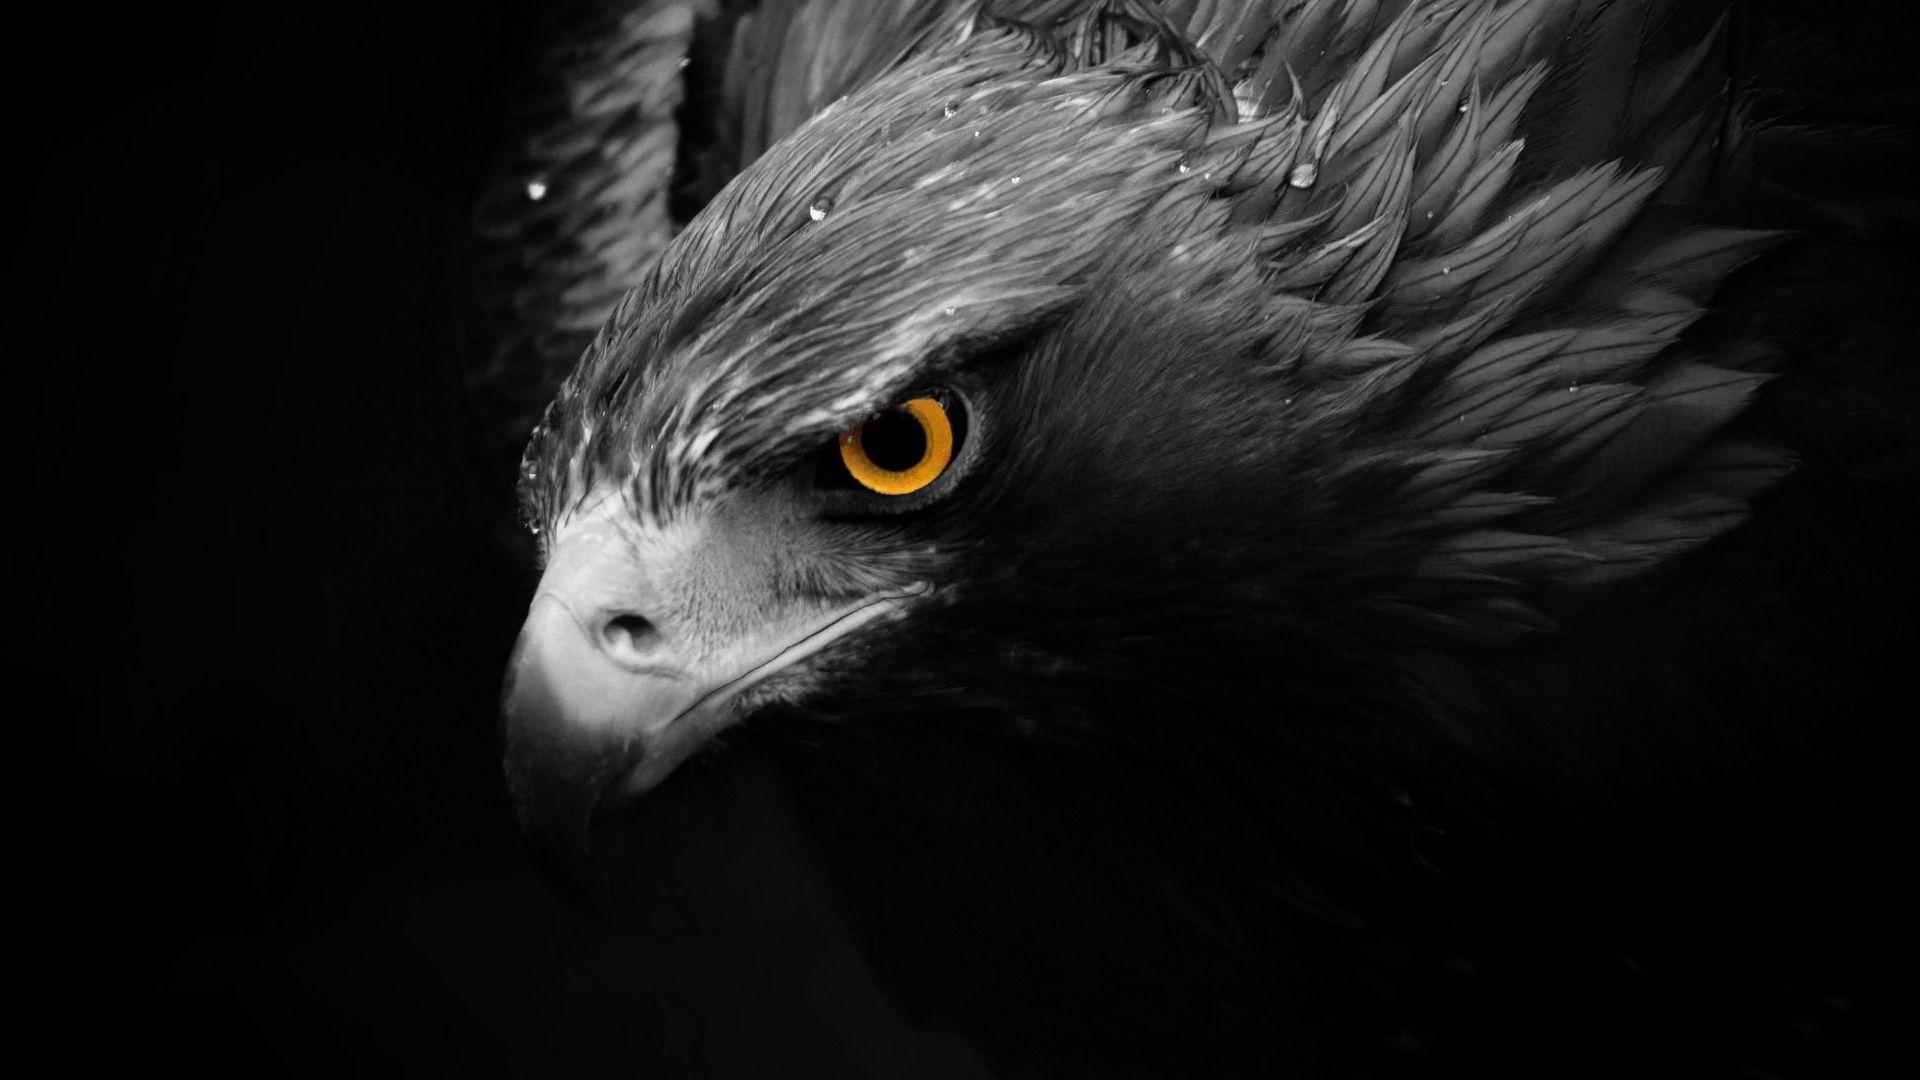 Animal Eagle Wallpaper Eagle Wallpaper Birds Wallpaper Hd Animals